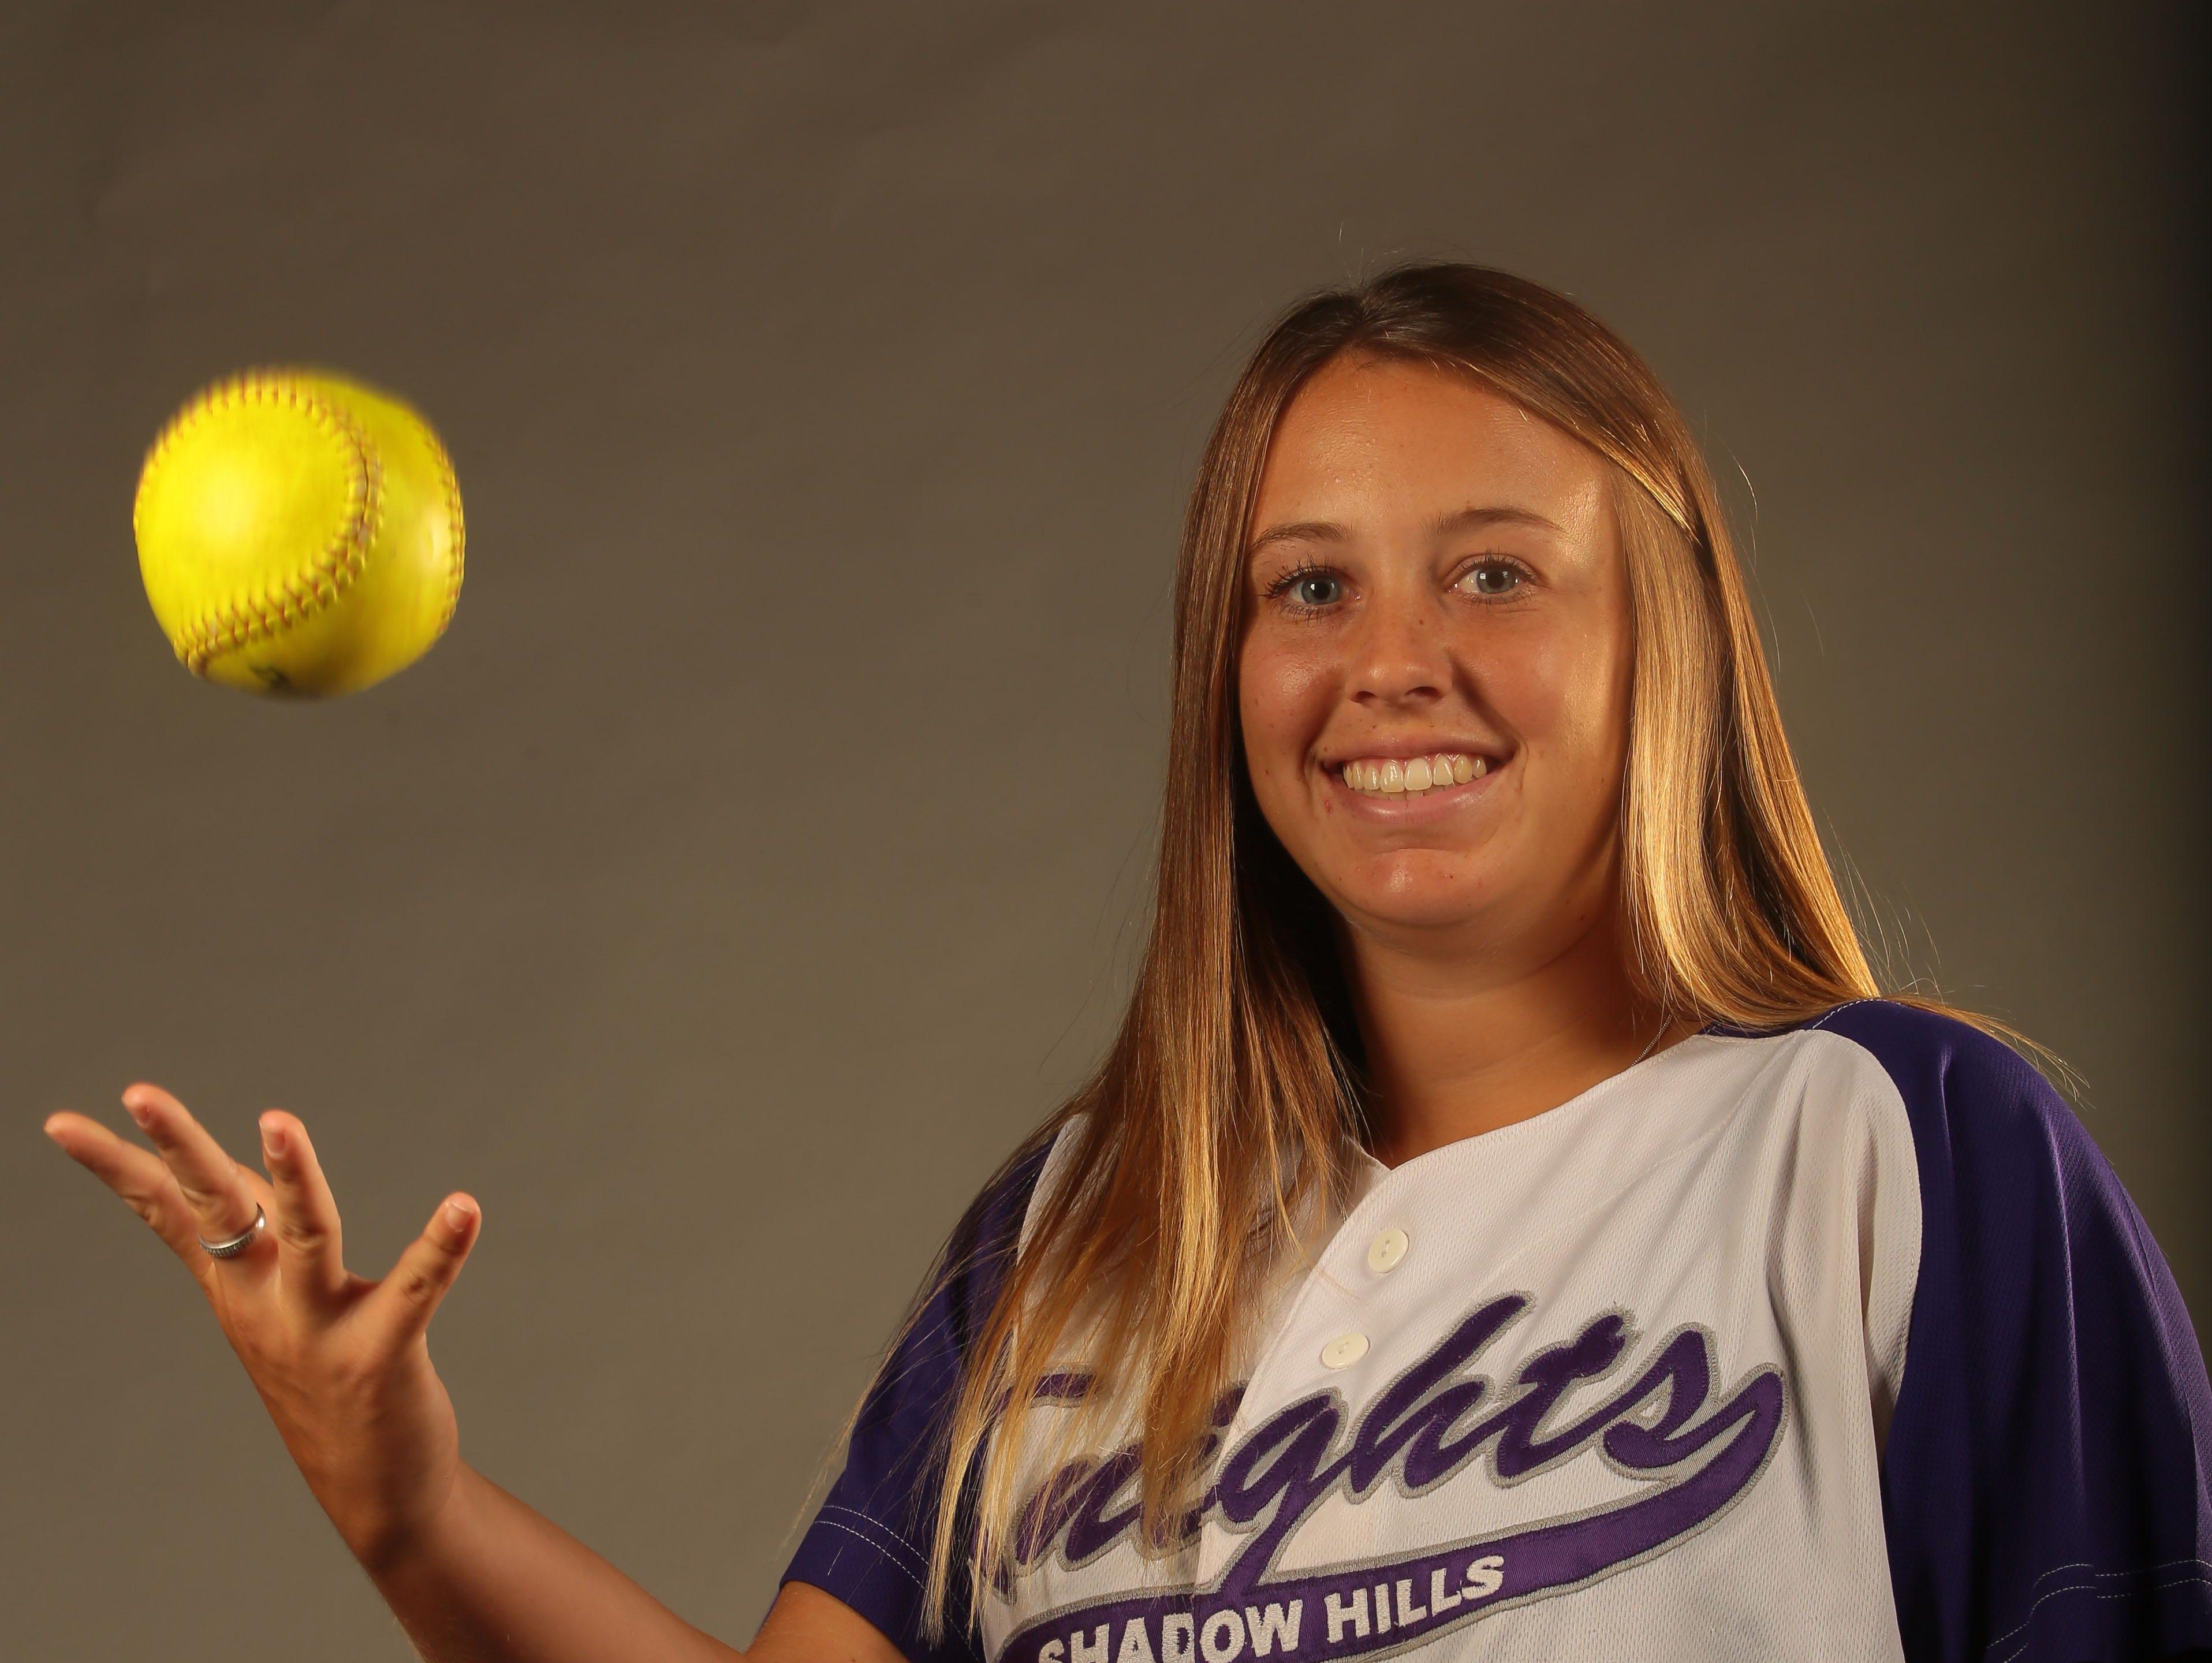 Caitlyn Whiteside, Shadow Hills softball player is the Desert Sun softball player of the year. Photographed on June 16, 2015 at the Desert Sun Studio.